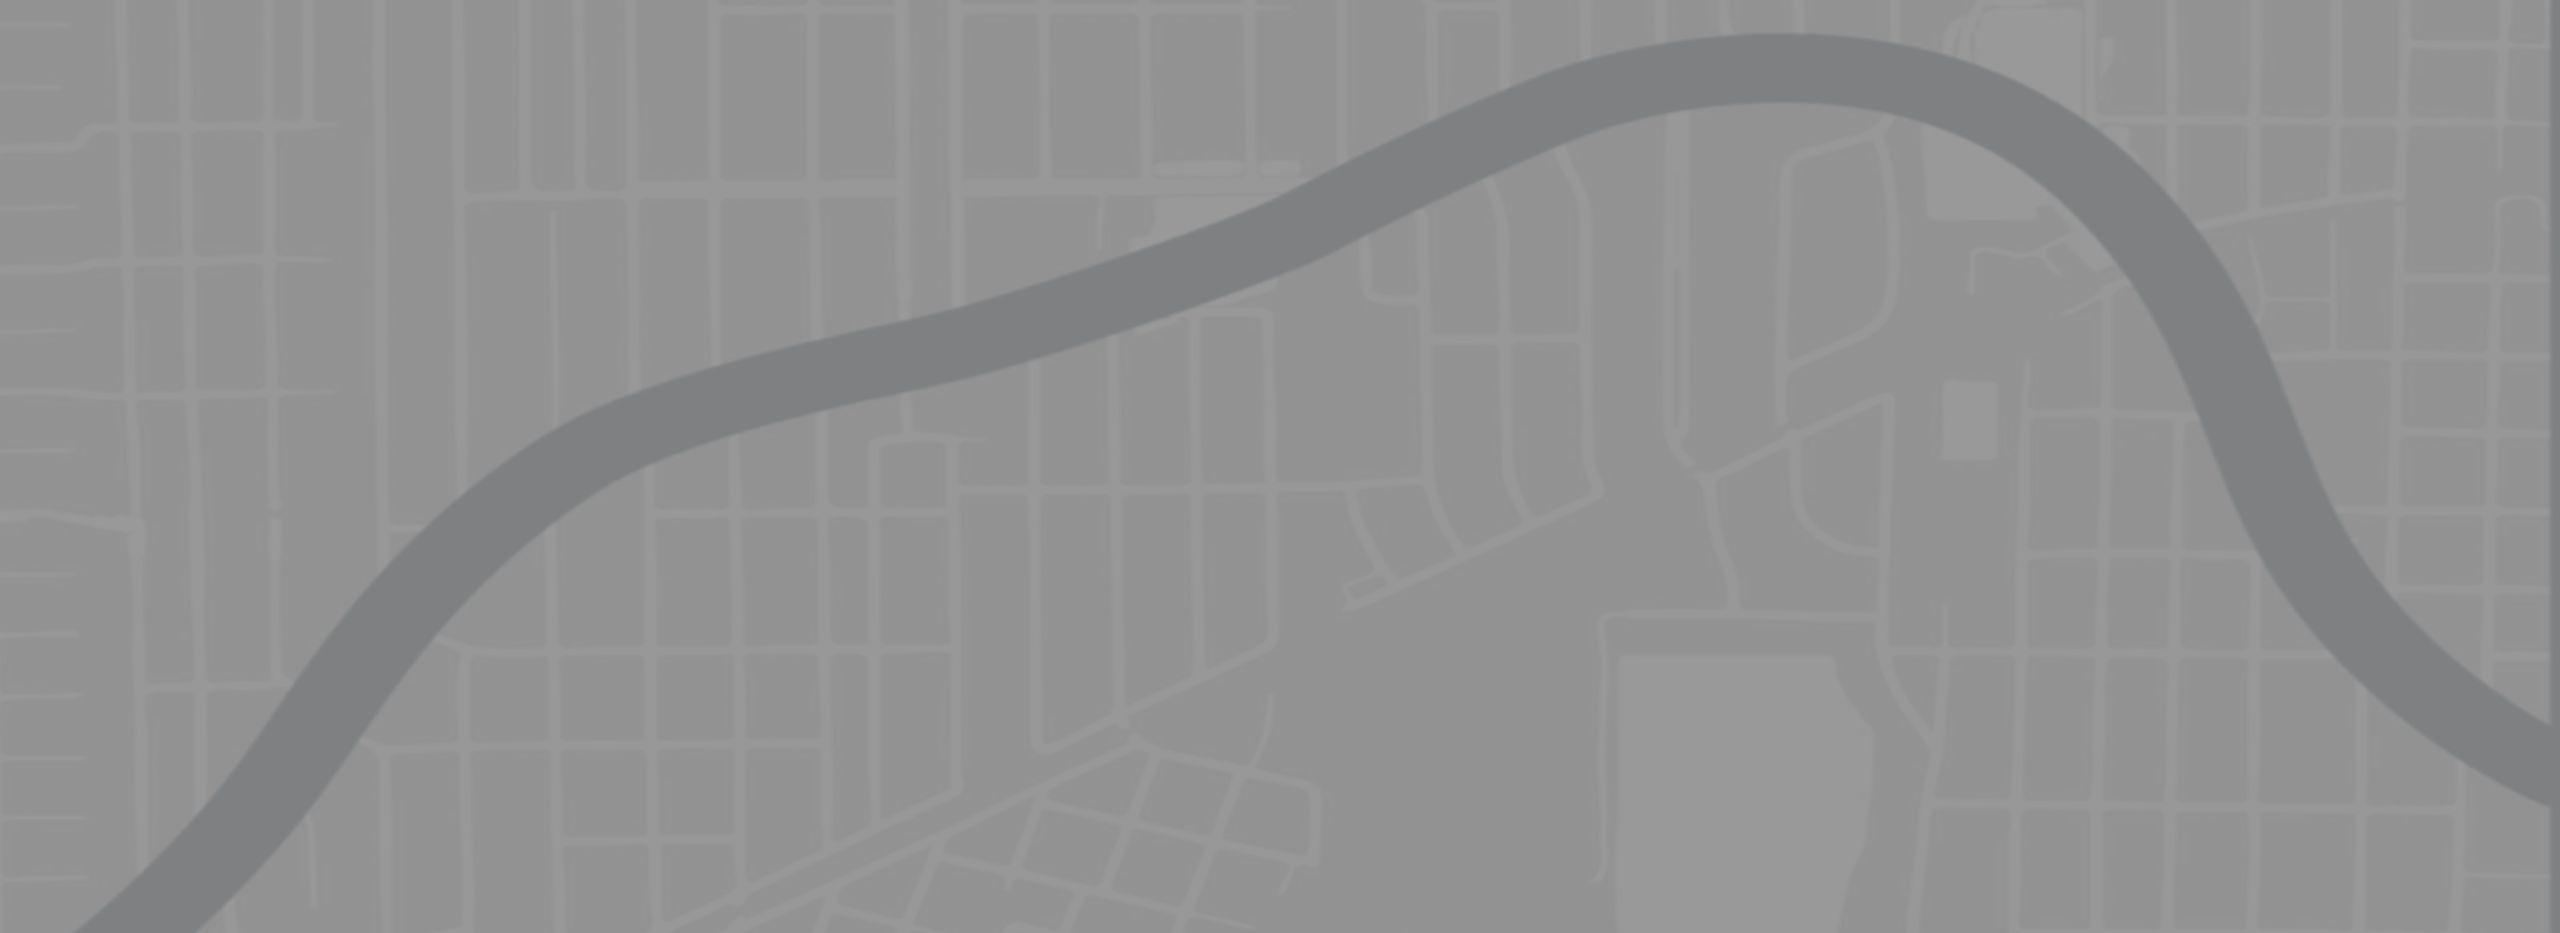 Old Metairie Market Update 9/23/19